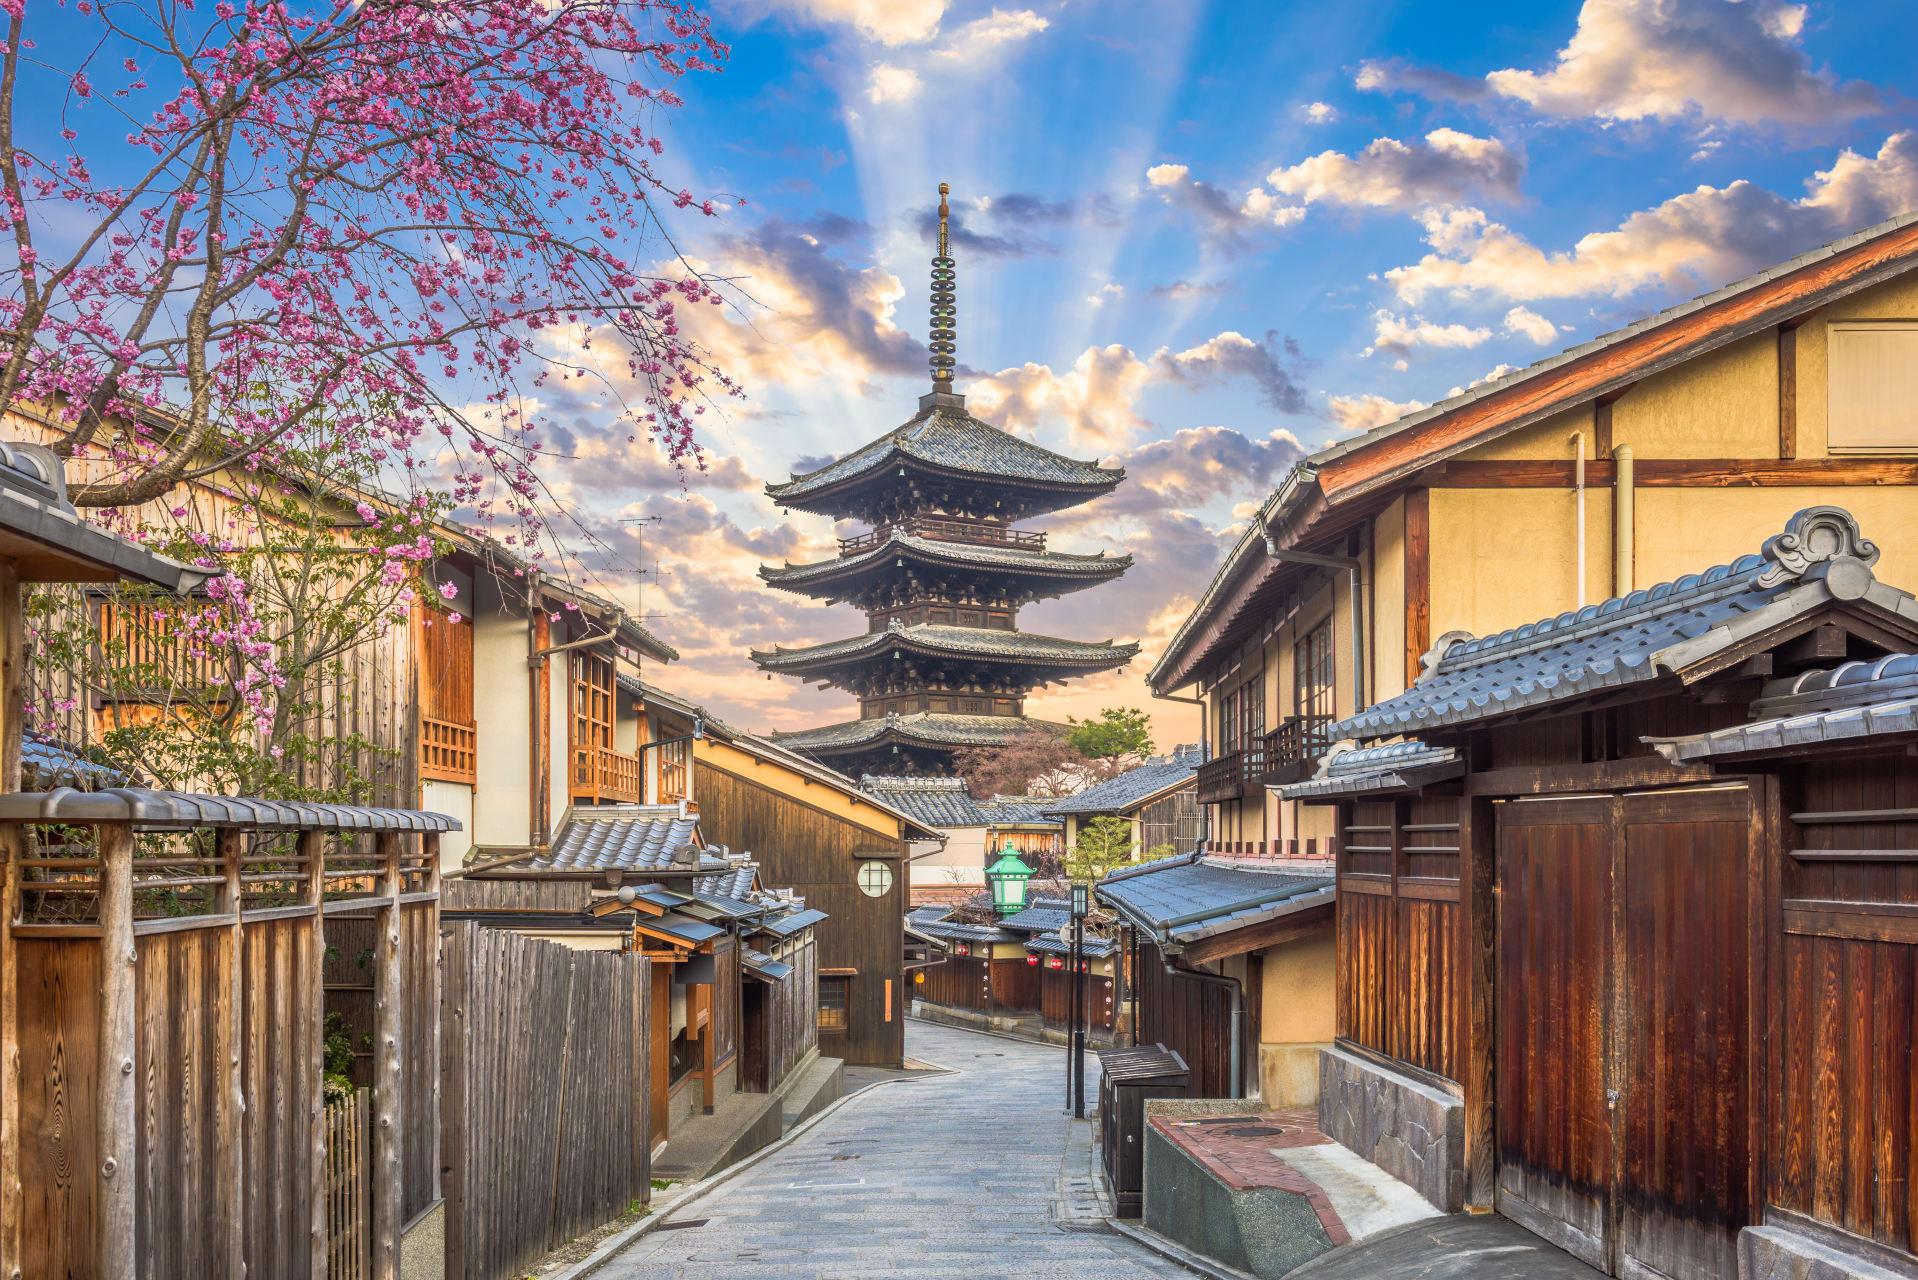 Kyoto - Explore Kyoto's traditional neighborhood, Higashiyama